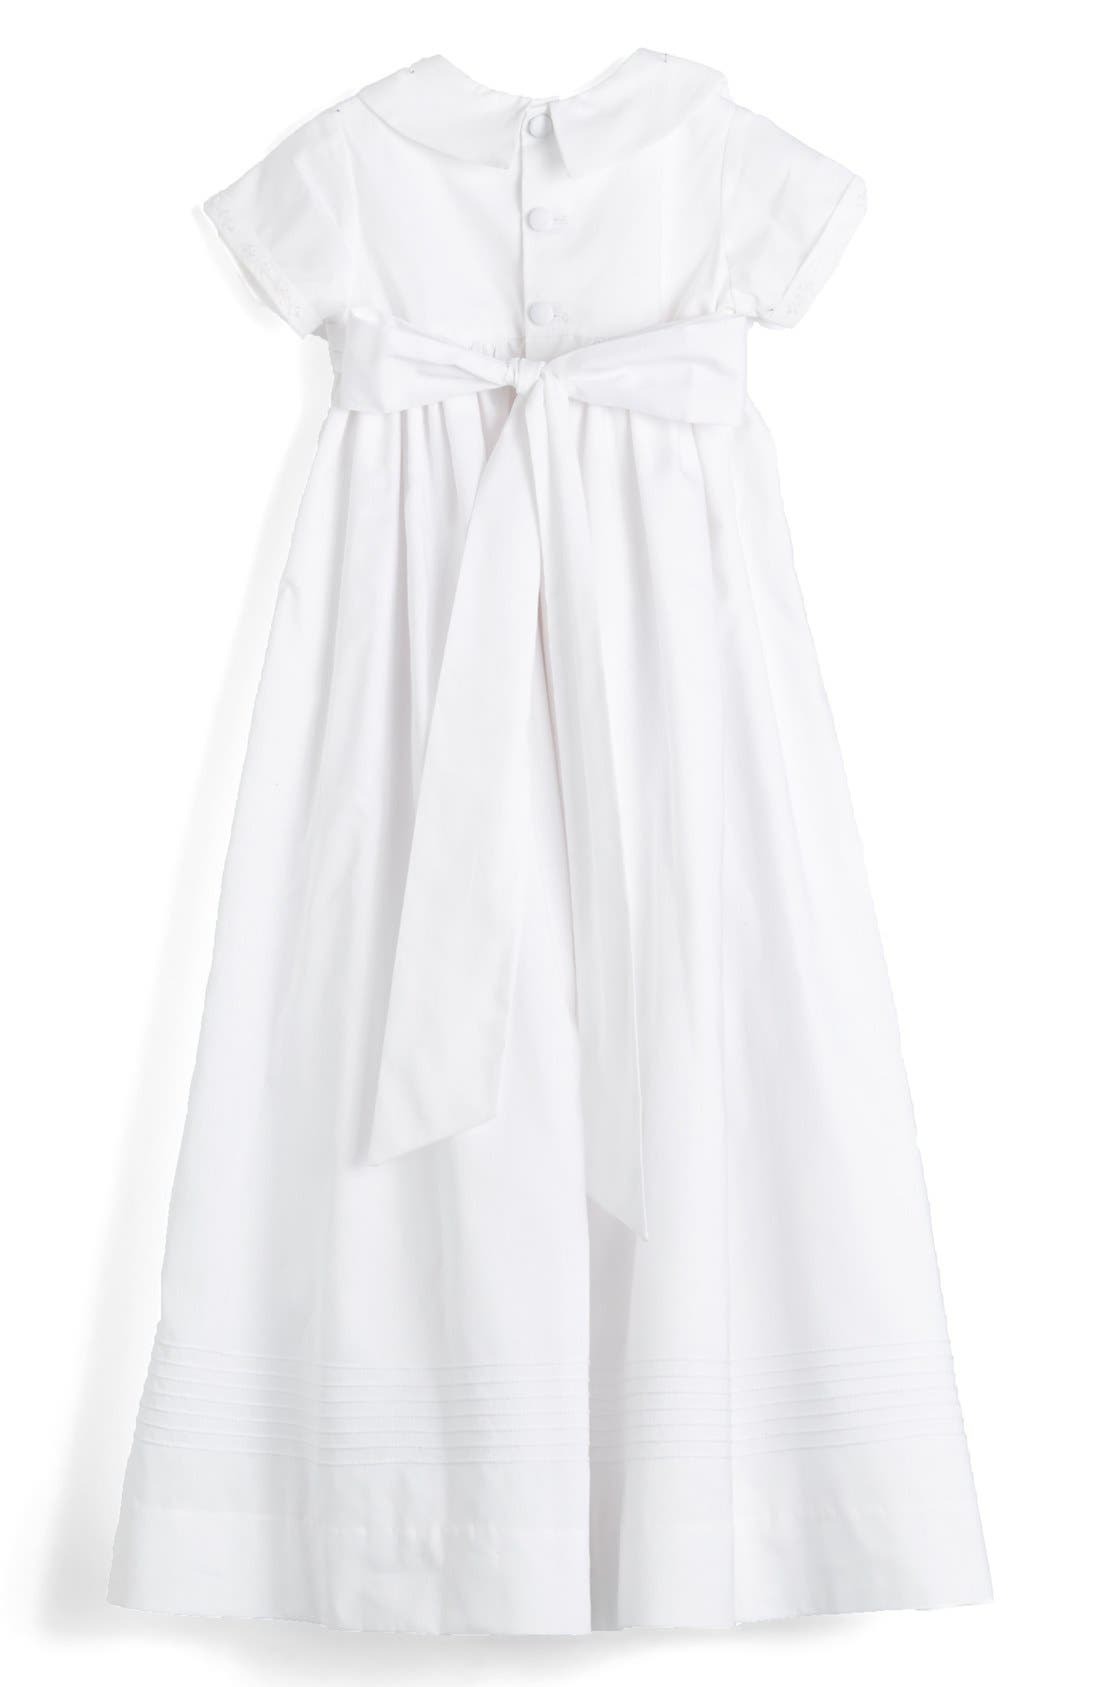 Alternate Image 2  - Isabel Garreton 'Classic' Christening Gown & Bonnet (Baby)